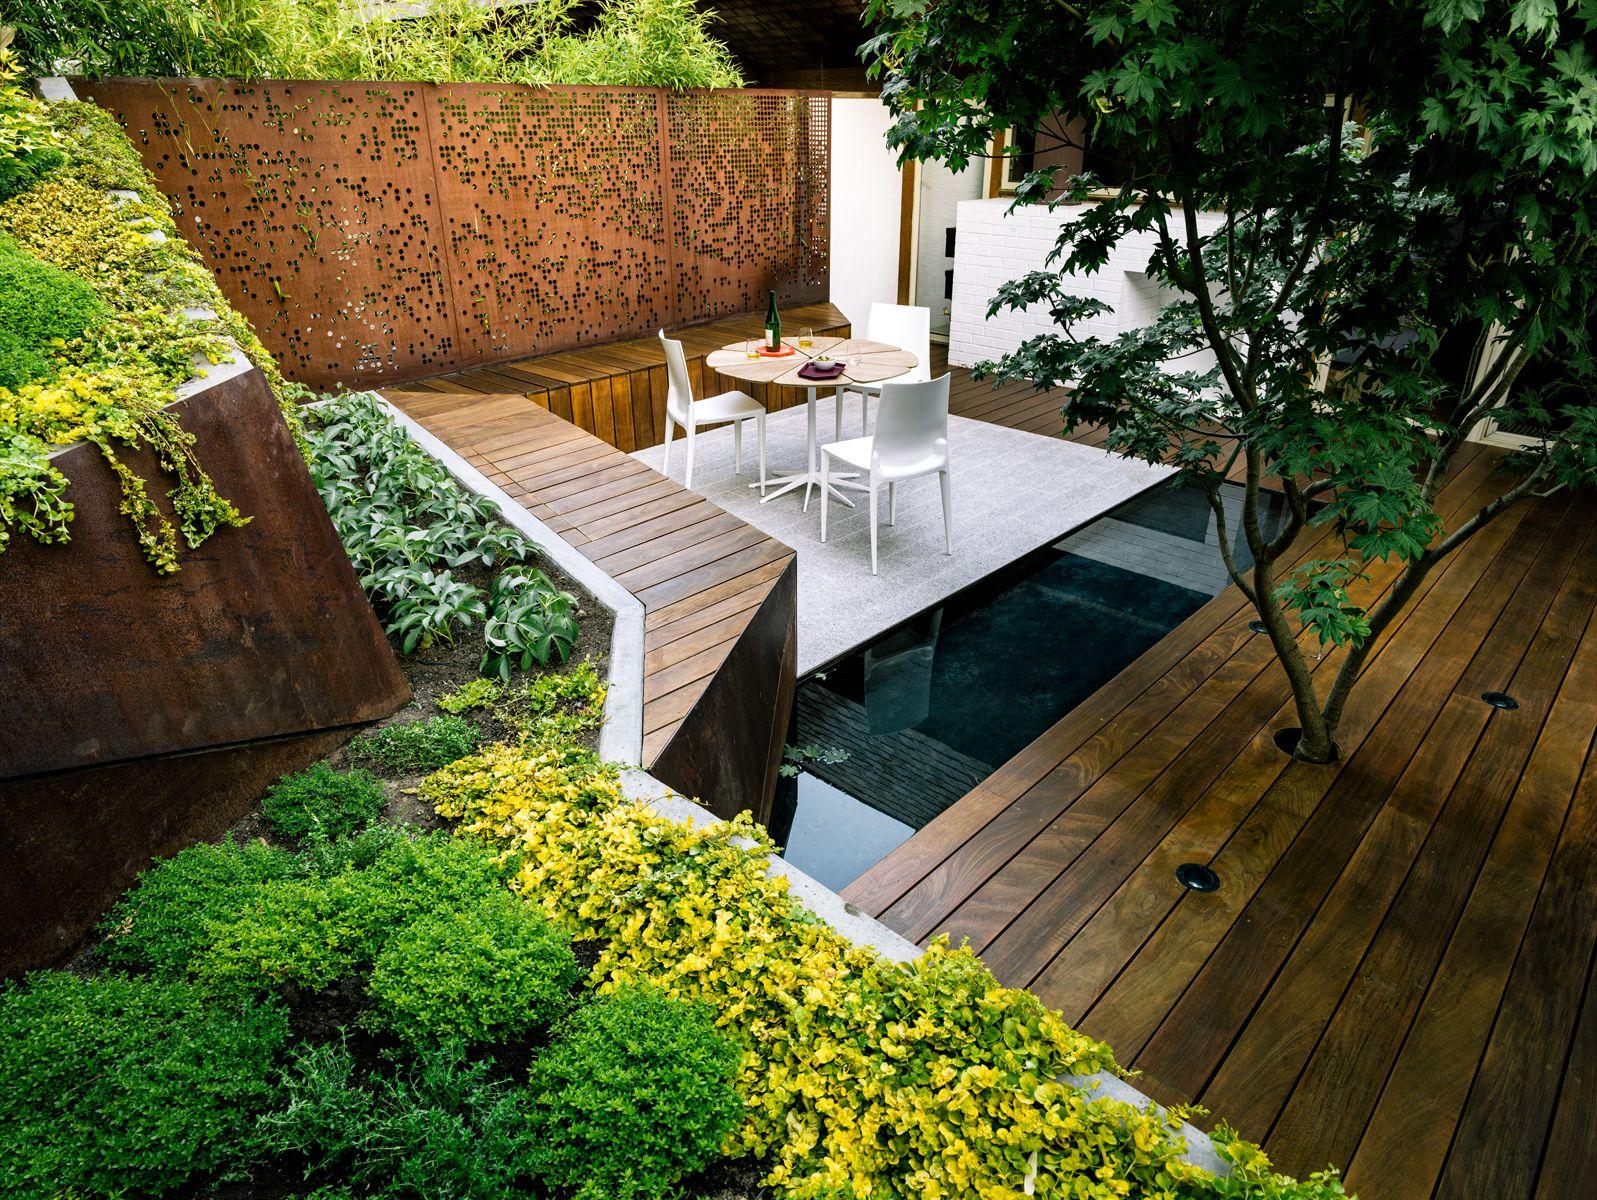 hilgard garden, un jardin étagé à san francisco | jardin | pinterest